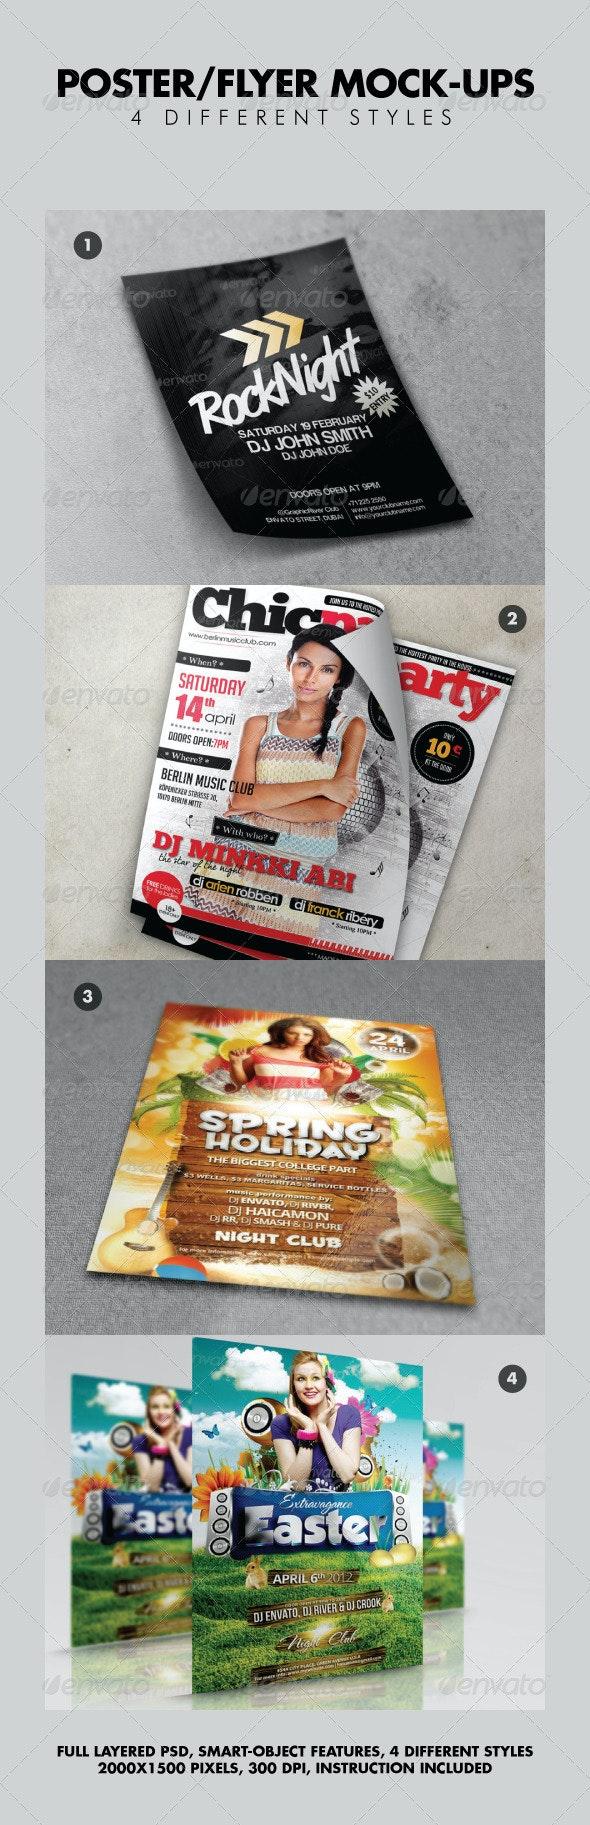 Various Poster / Flyer Mock-ups V2 - Flyers Print